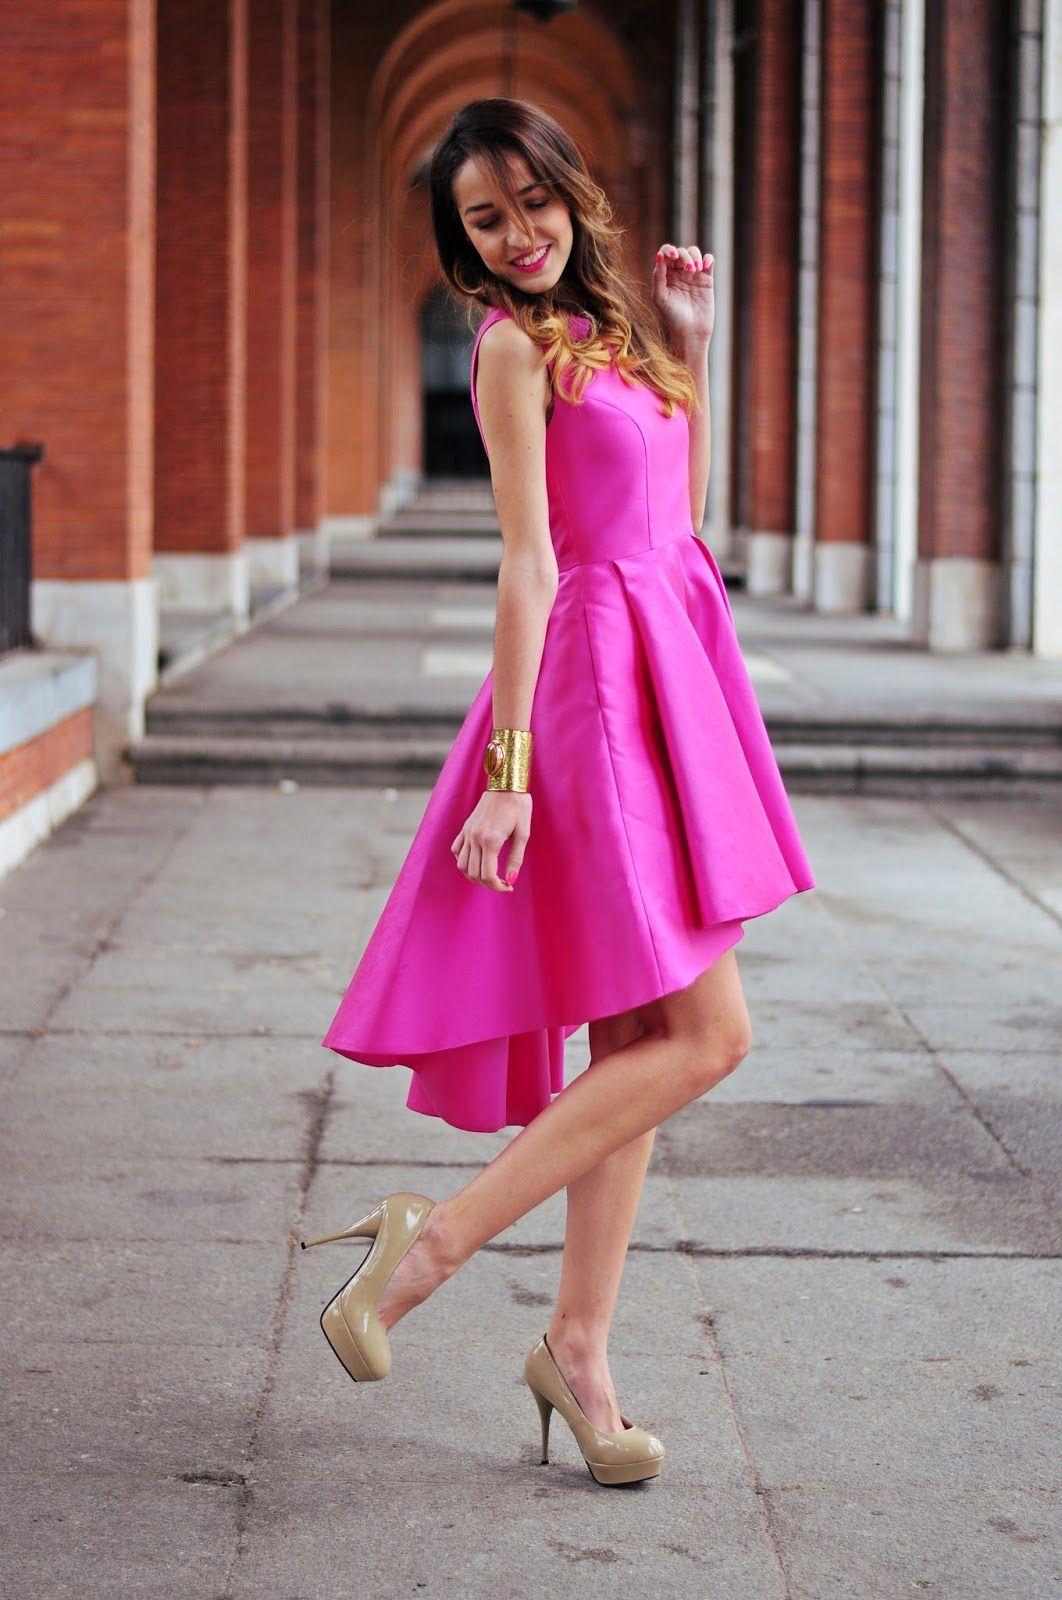 Blog de moda, tendencias, lookbook, streetstyle, fashion, looks ...